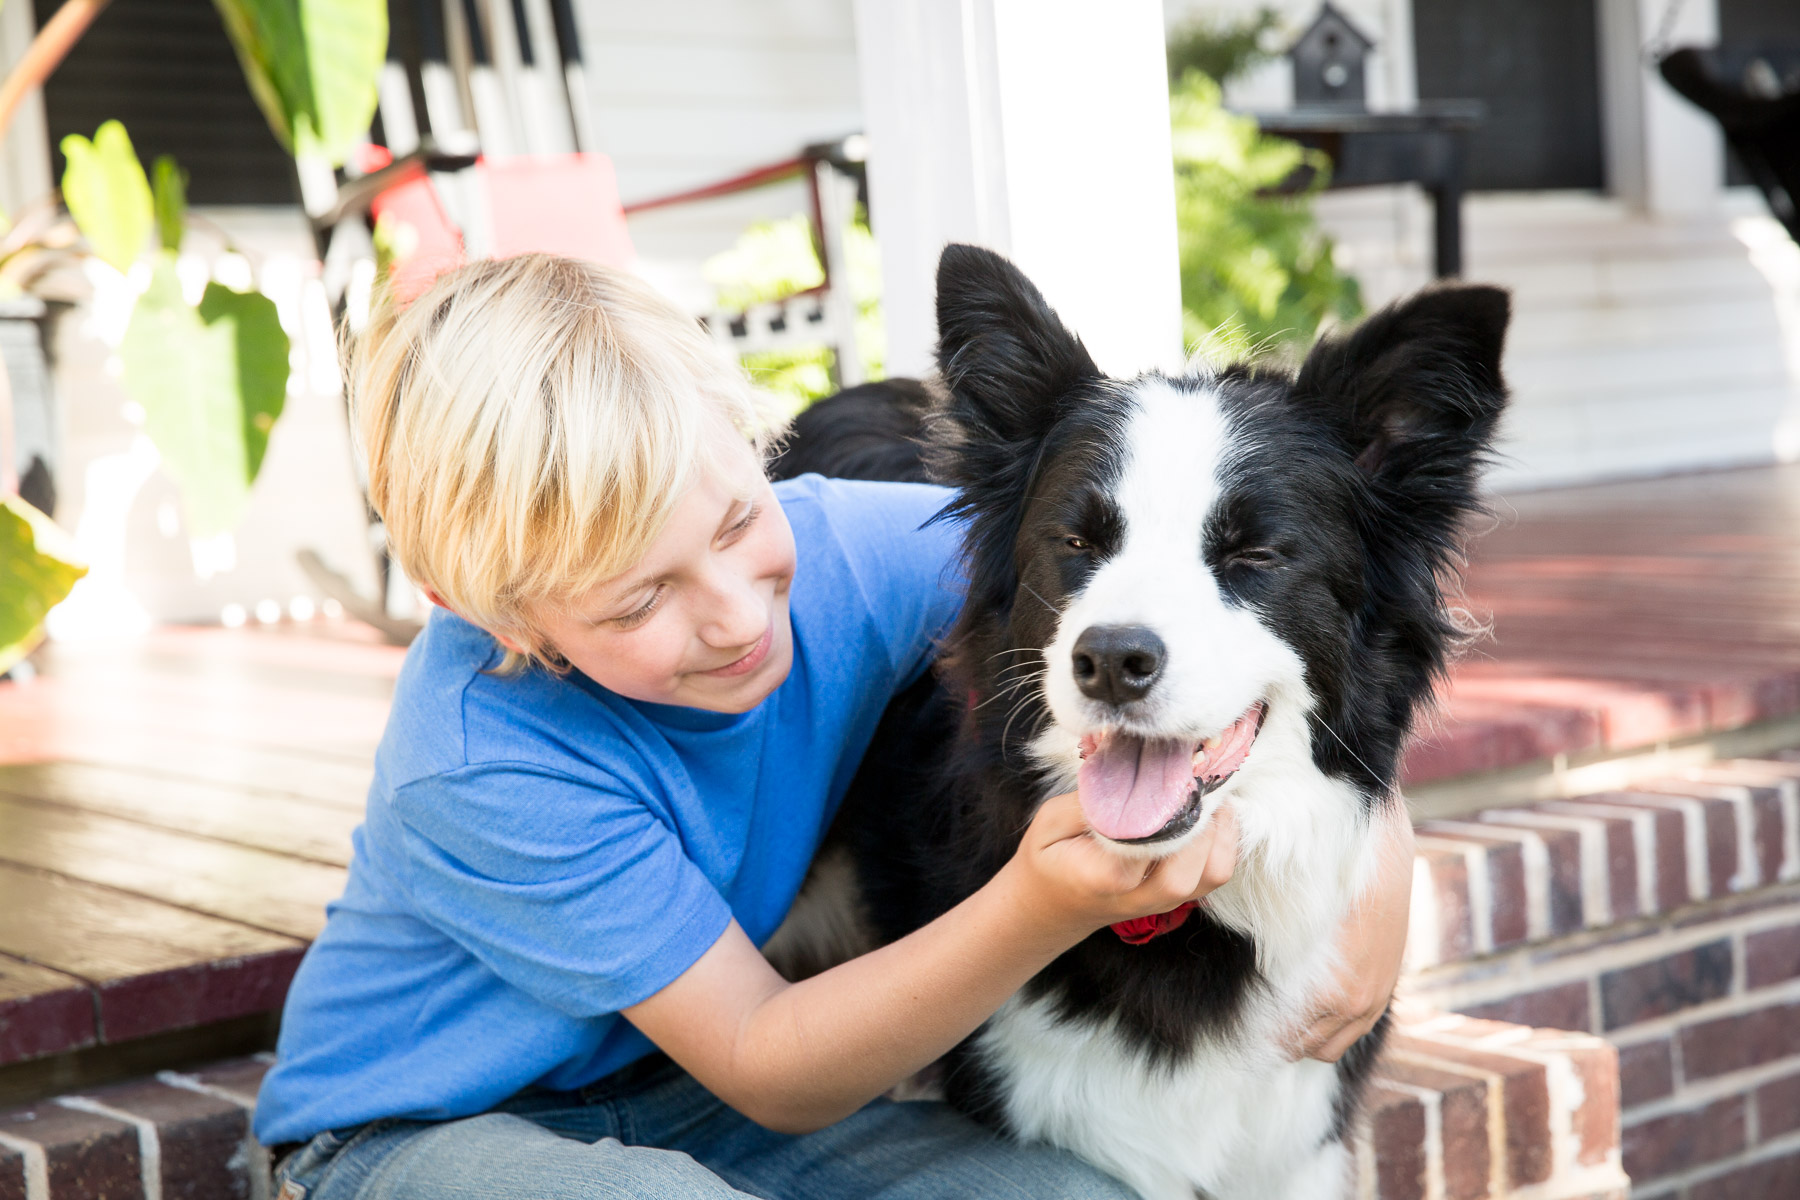 yong-kid-with-dog-love-bond.jpg